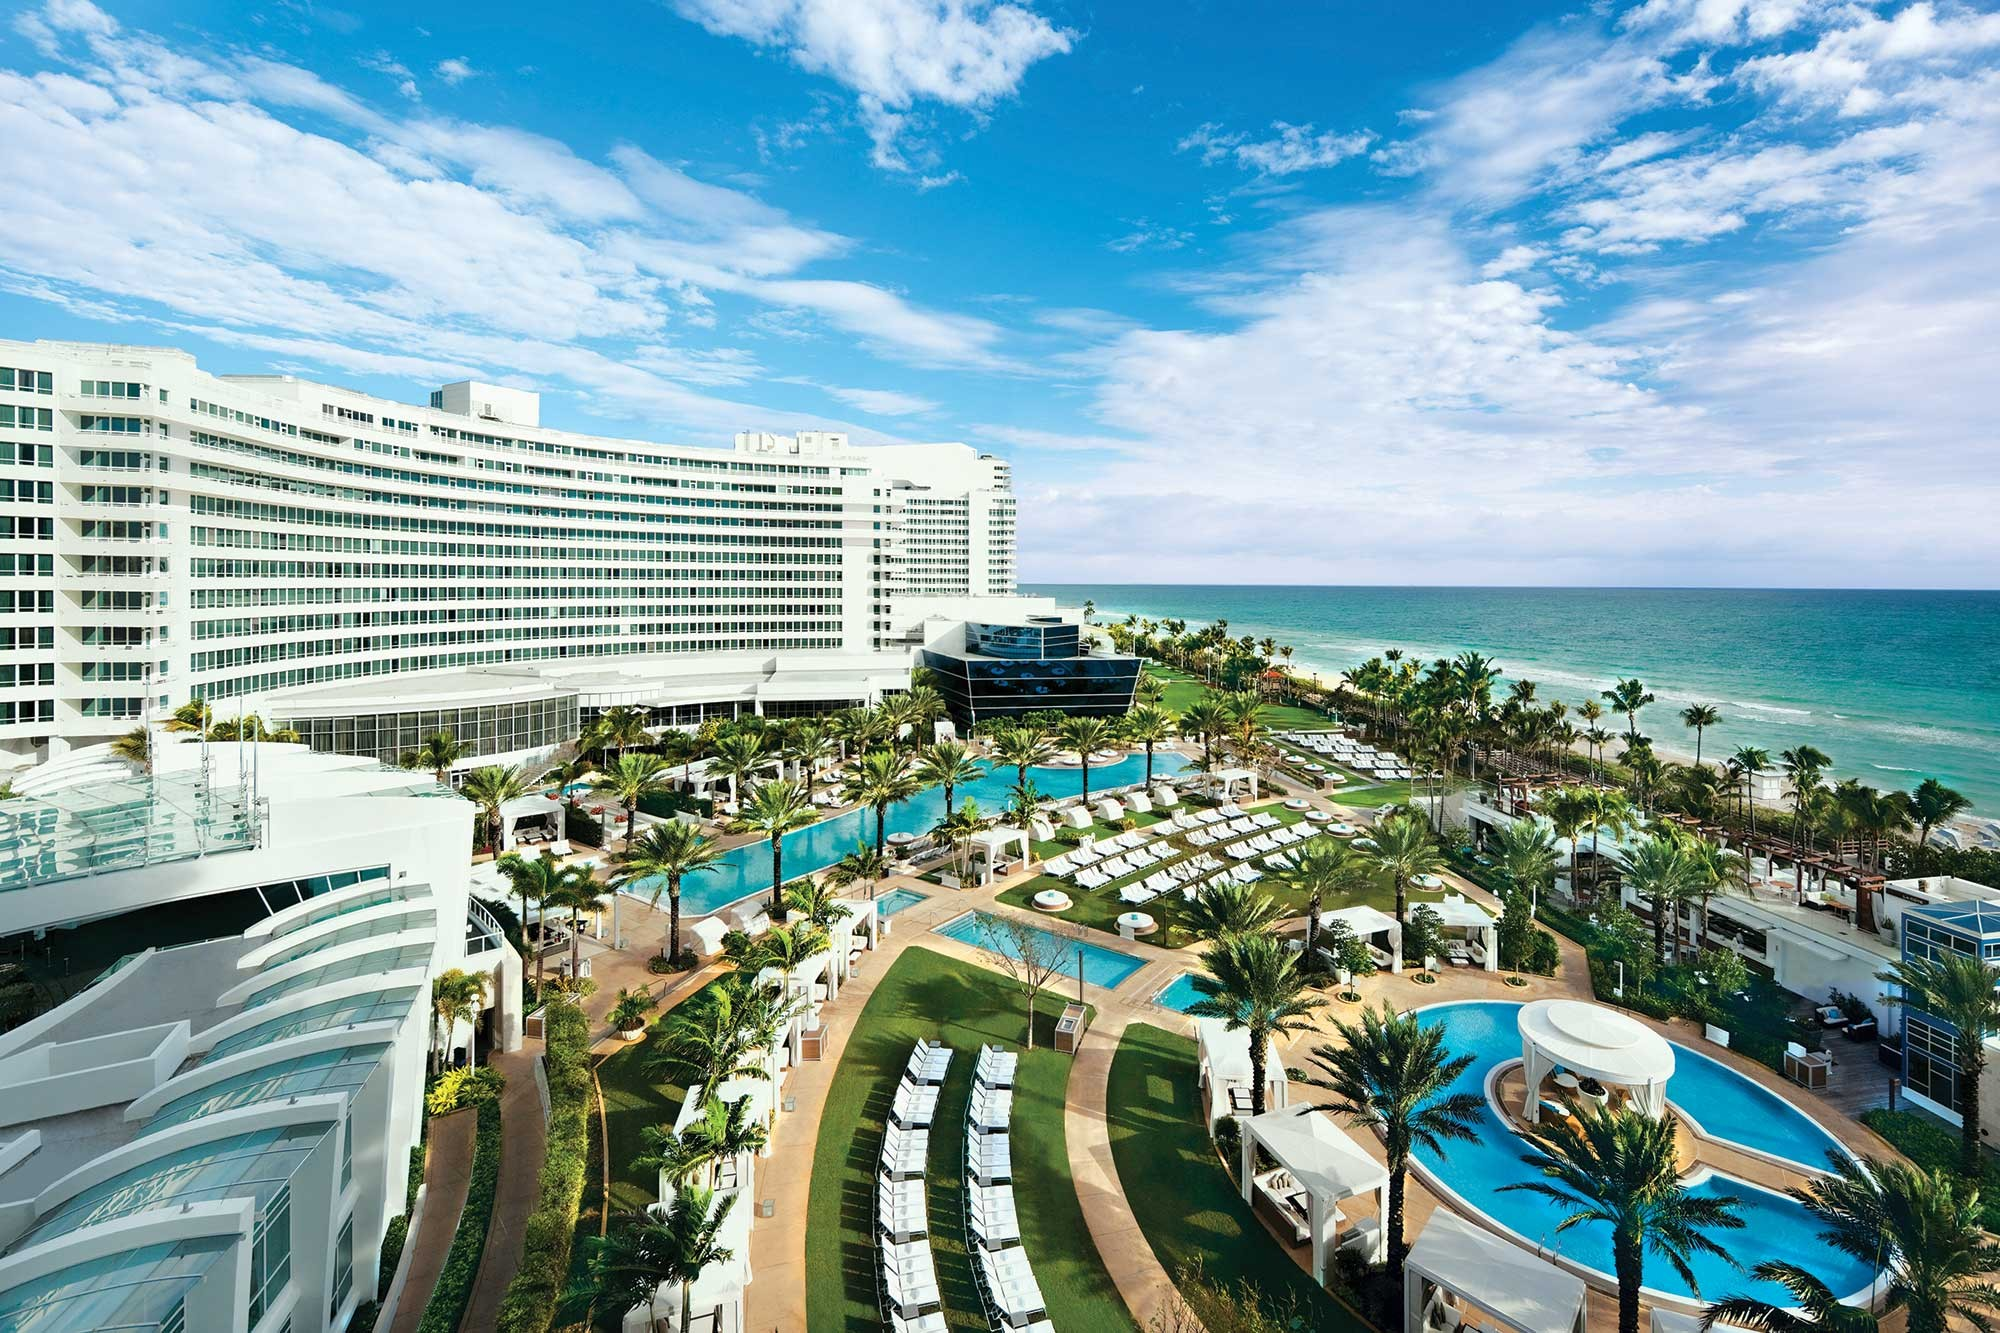 Fontainebleau Miami Beach image 1